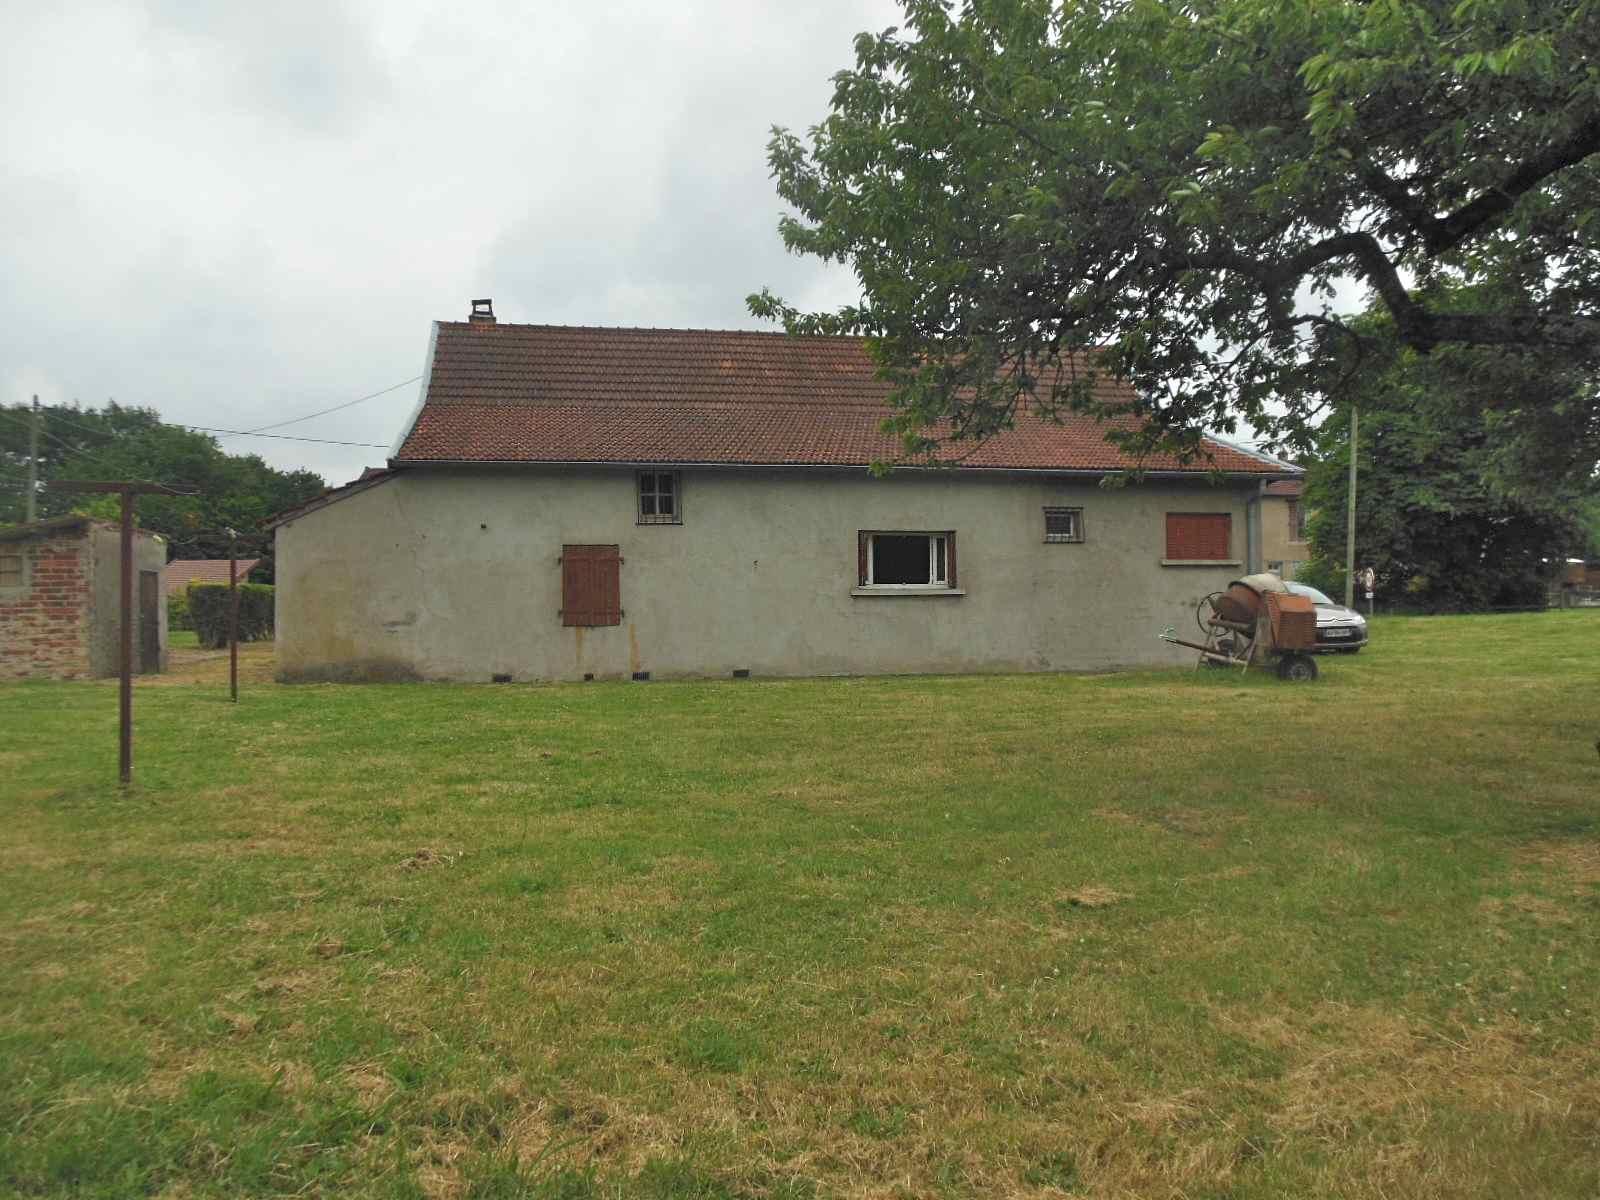 Vente maison d 39 habitation a restaurer for Vente habitation